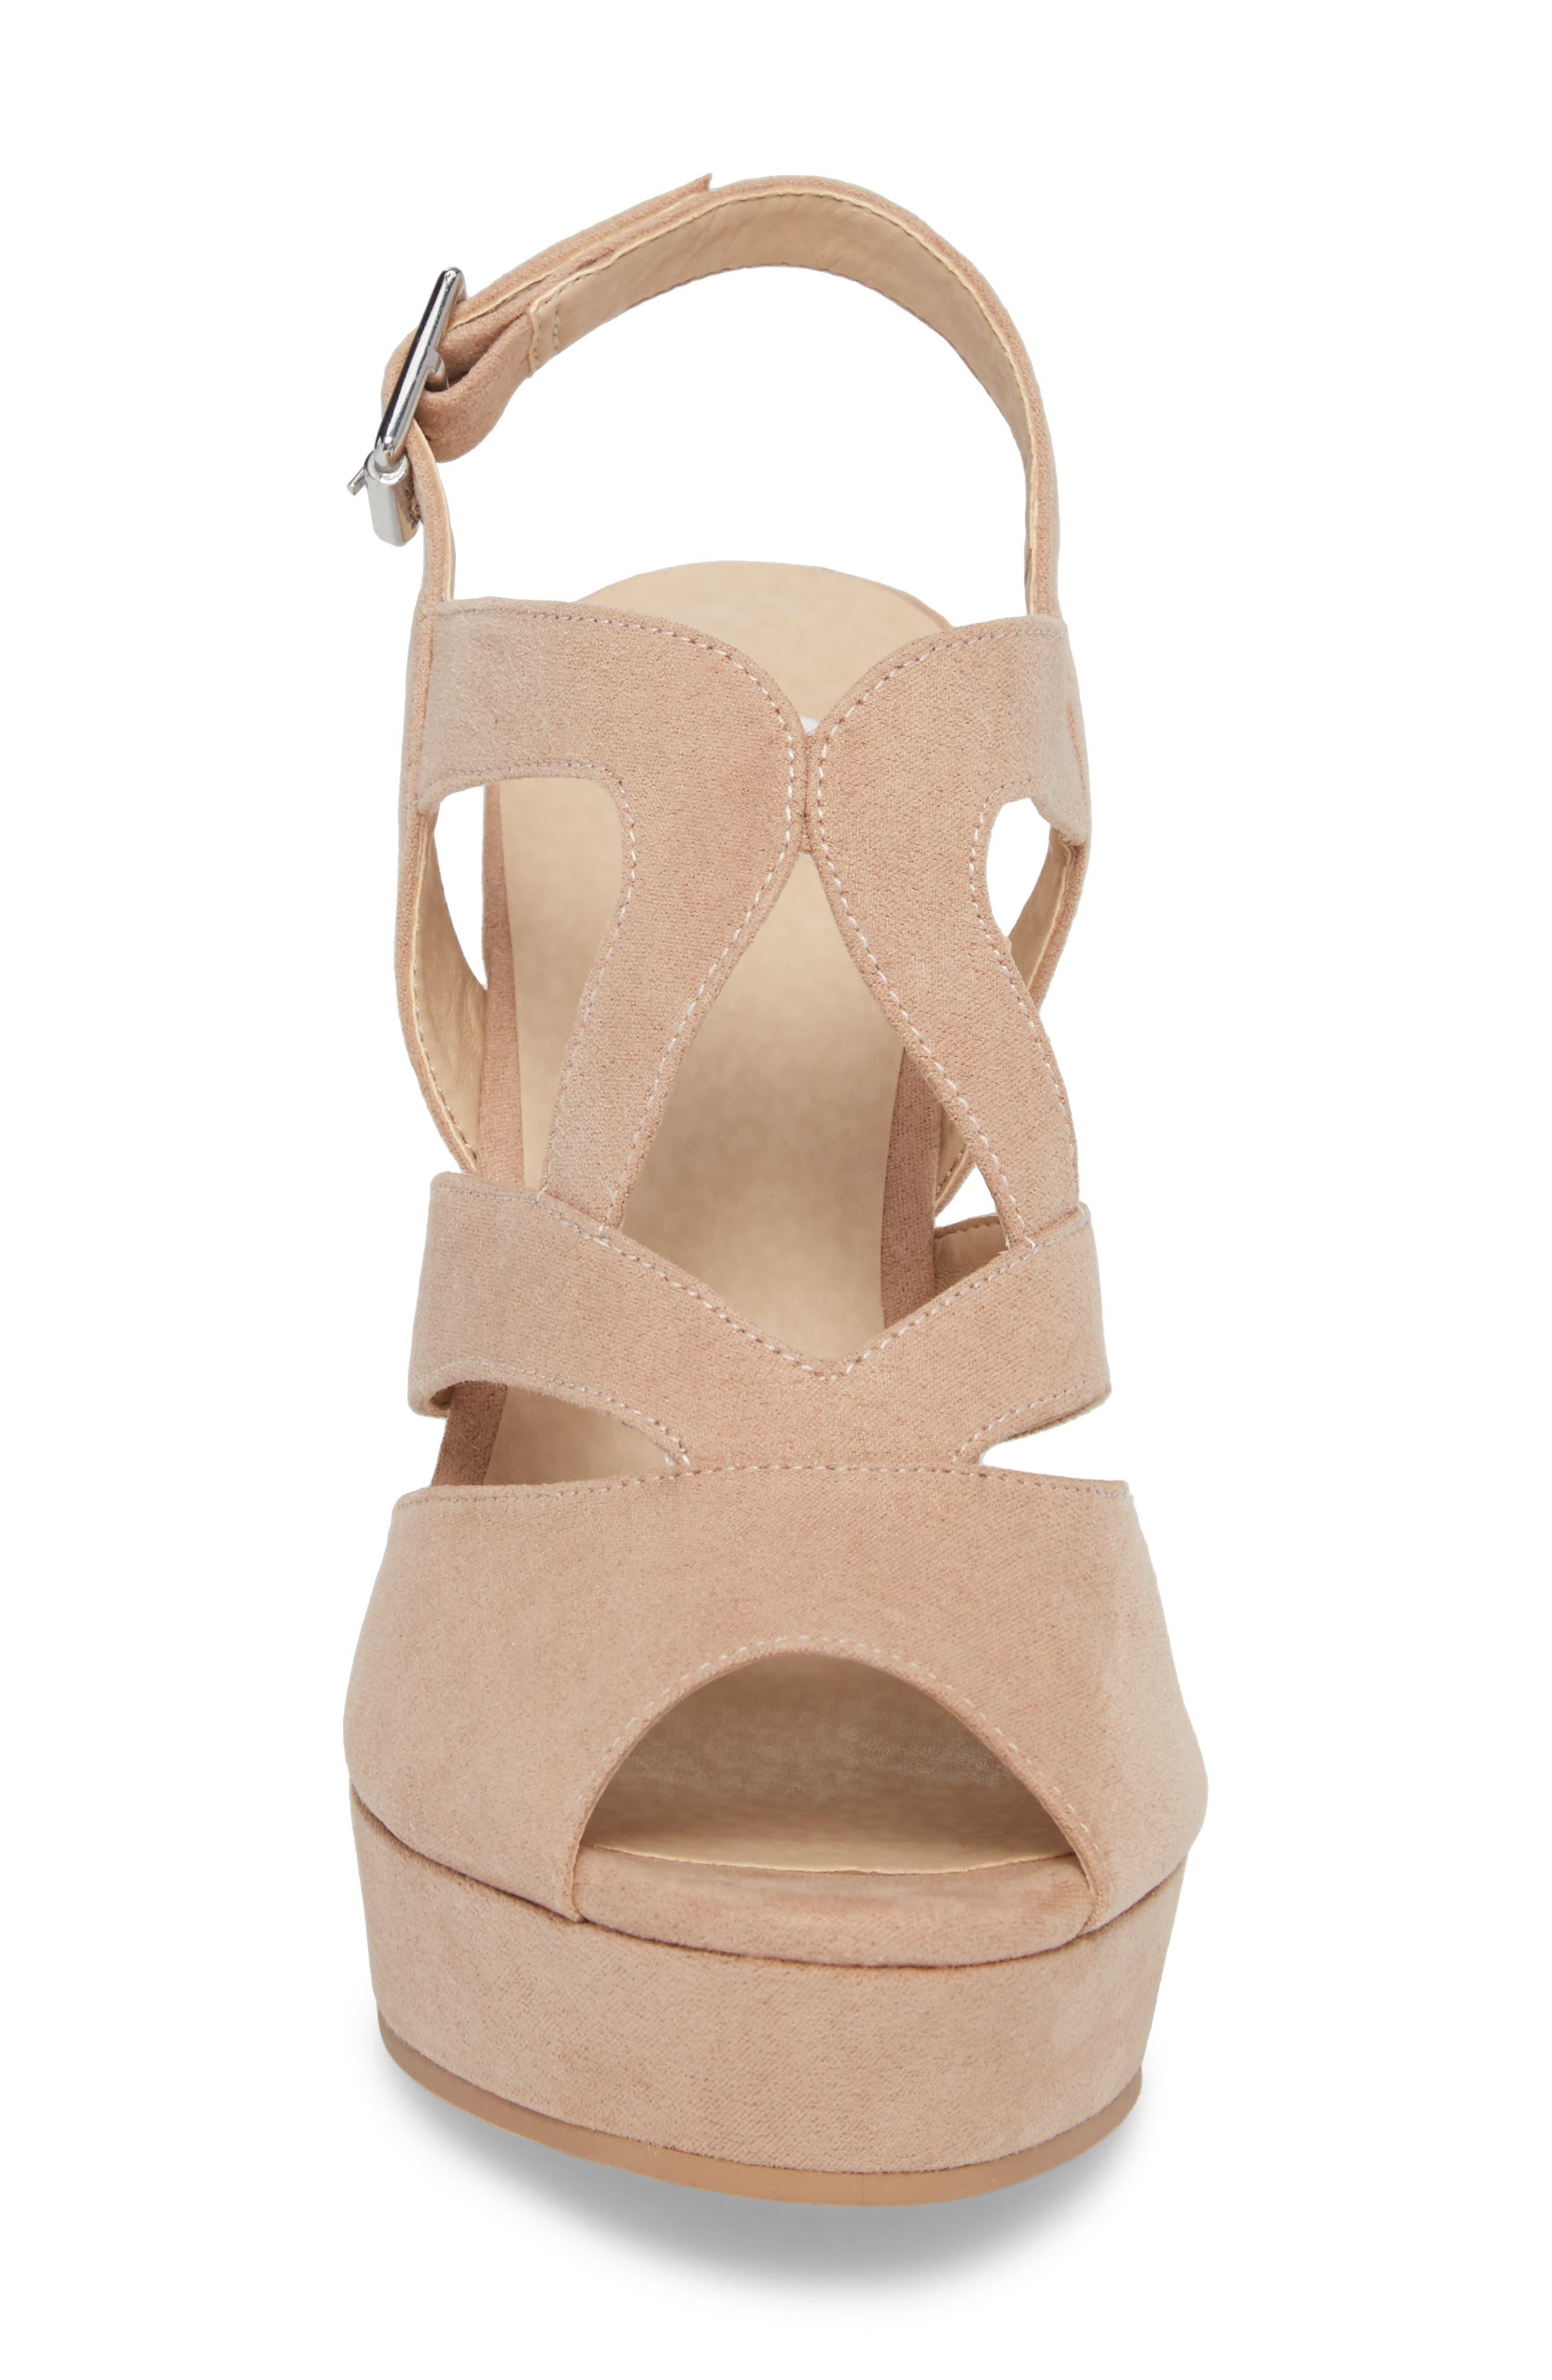 Sunny Platform Wedge Sandal,                             Alternate thumbnail 23, color,